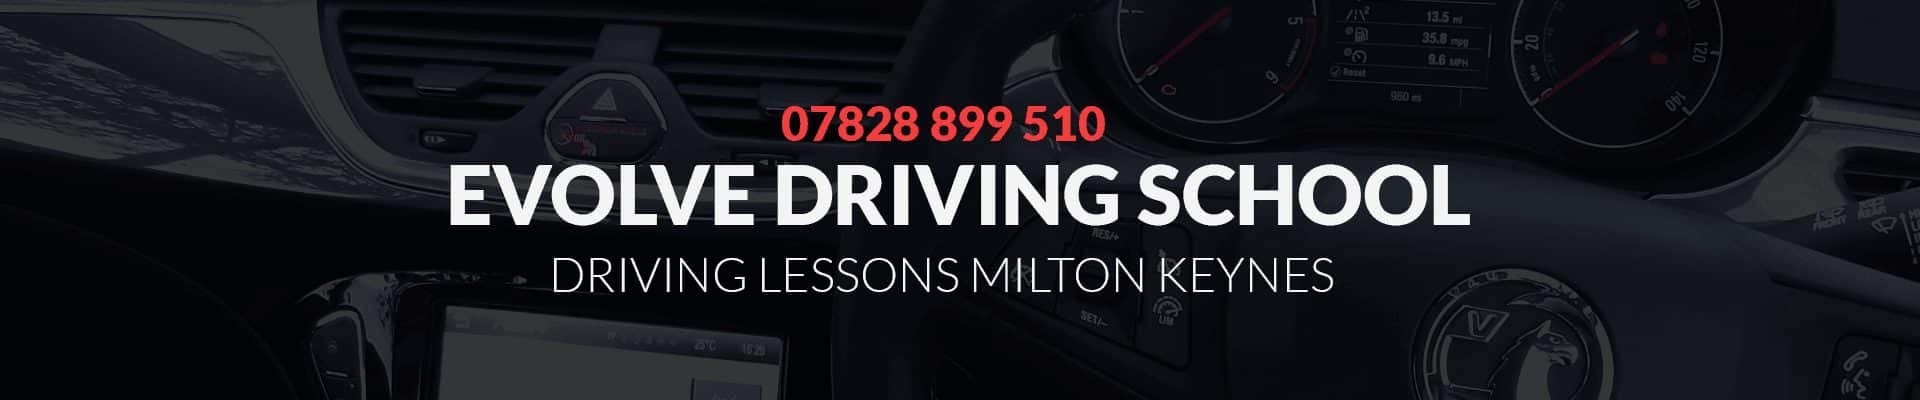 driving lessons milton keynes banner